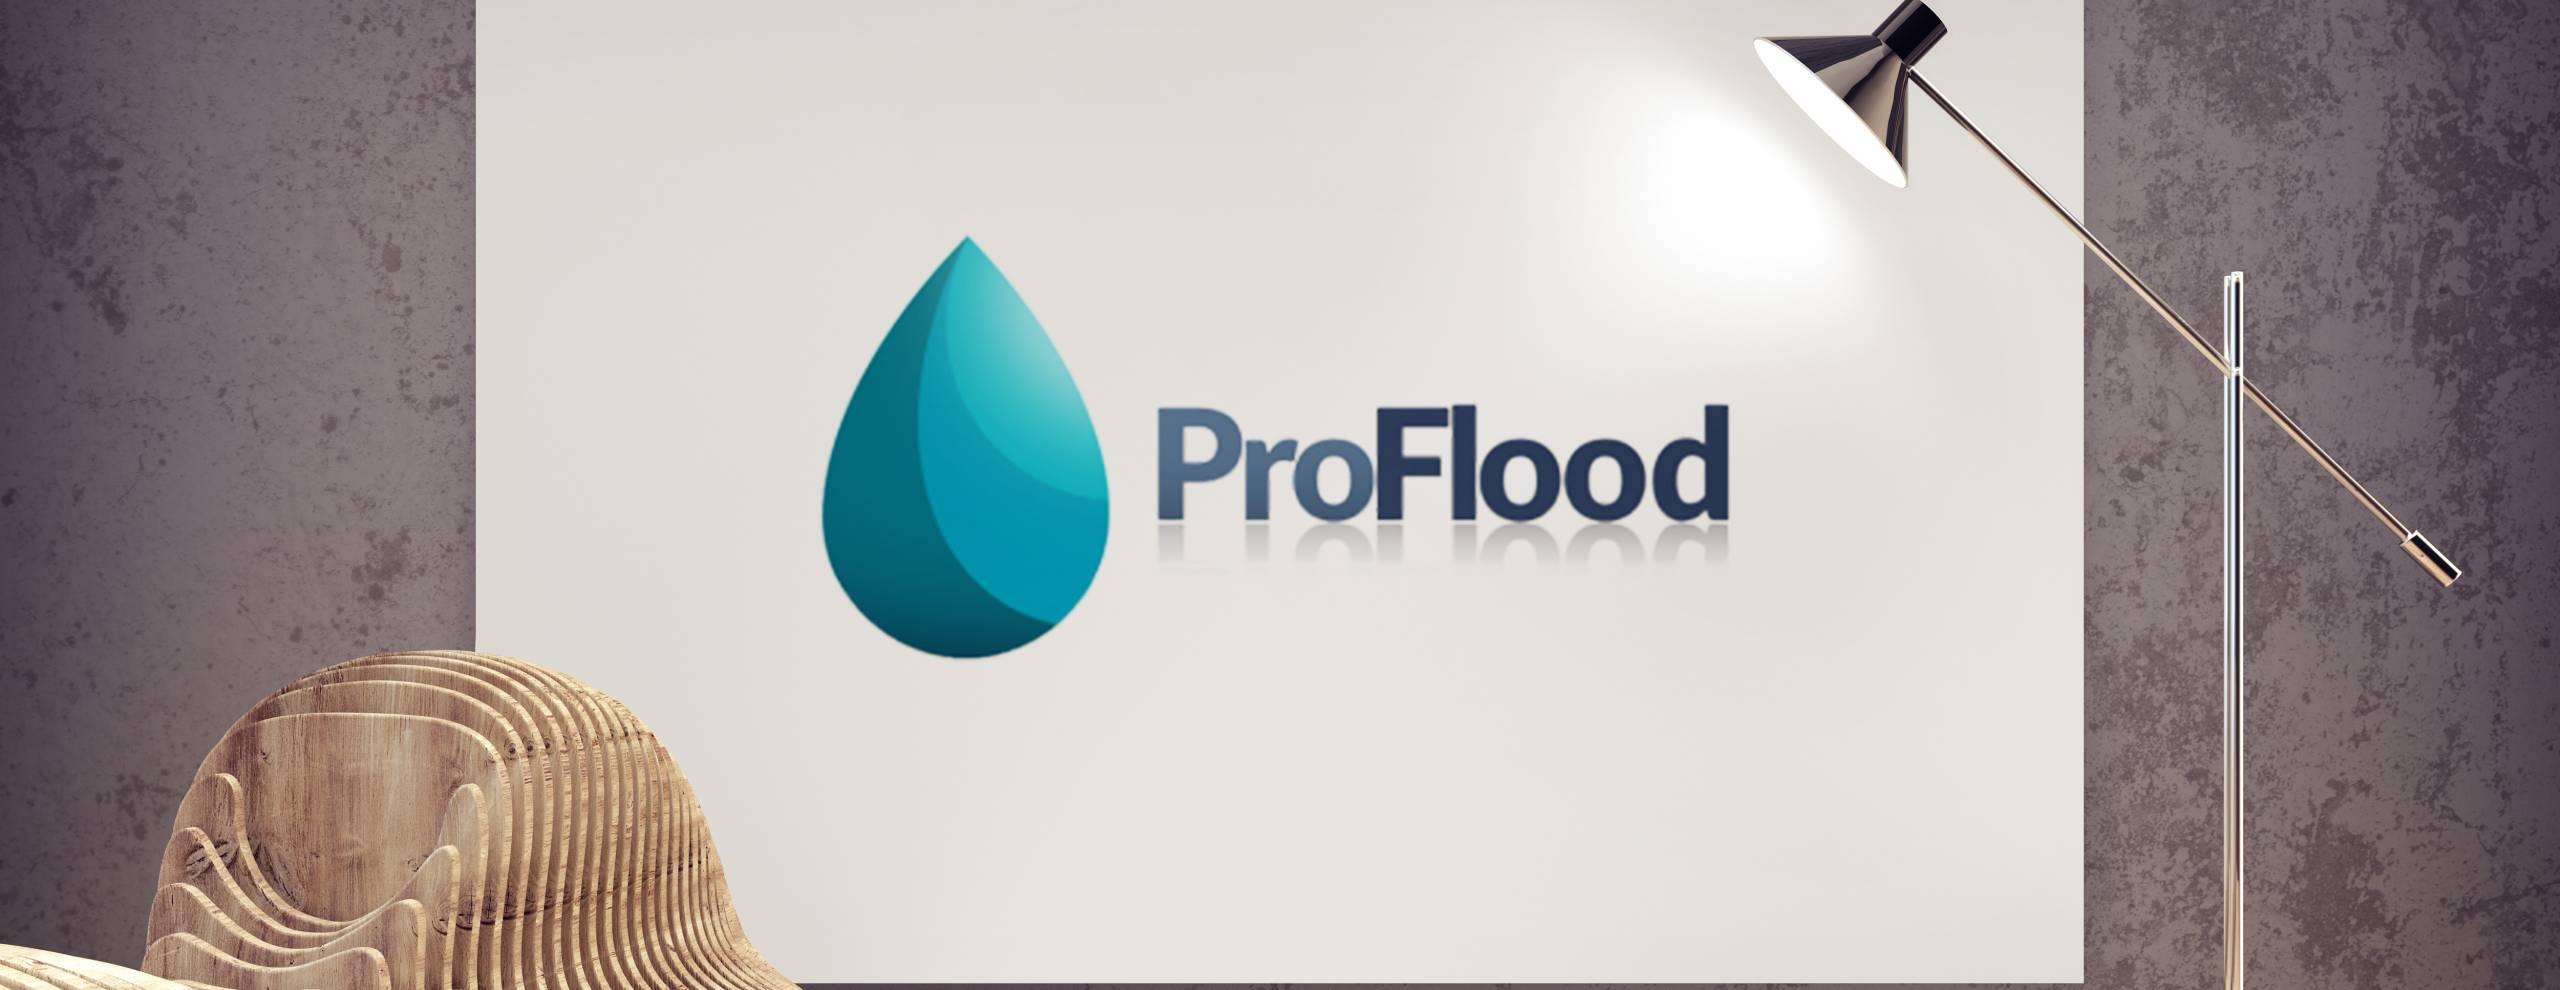 proflood-7